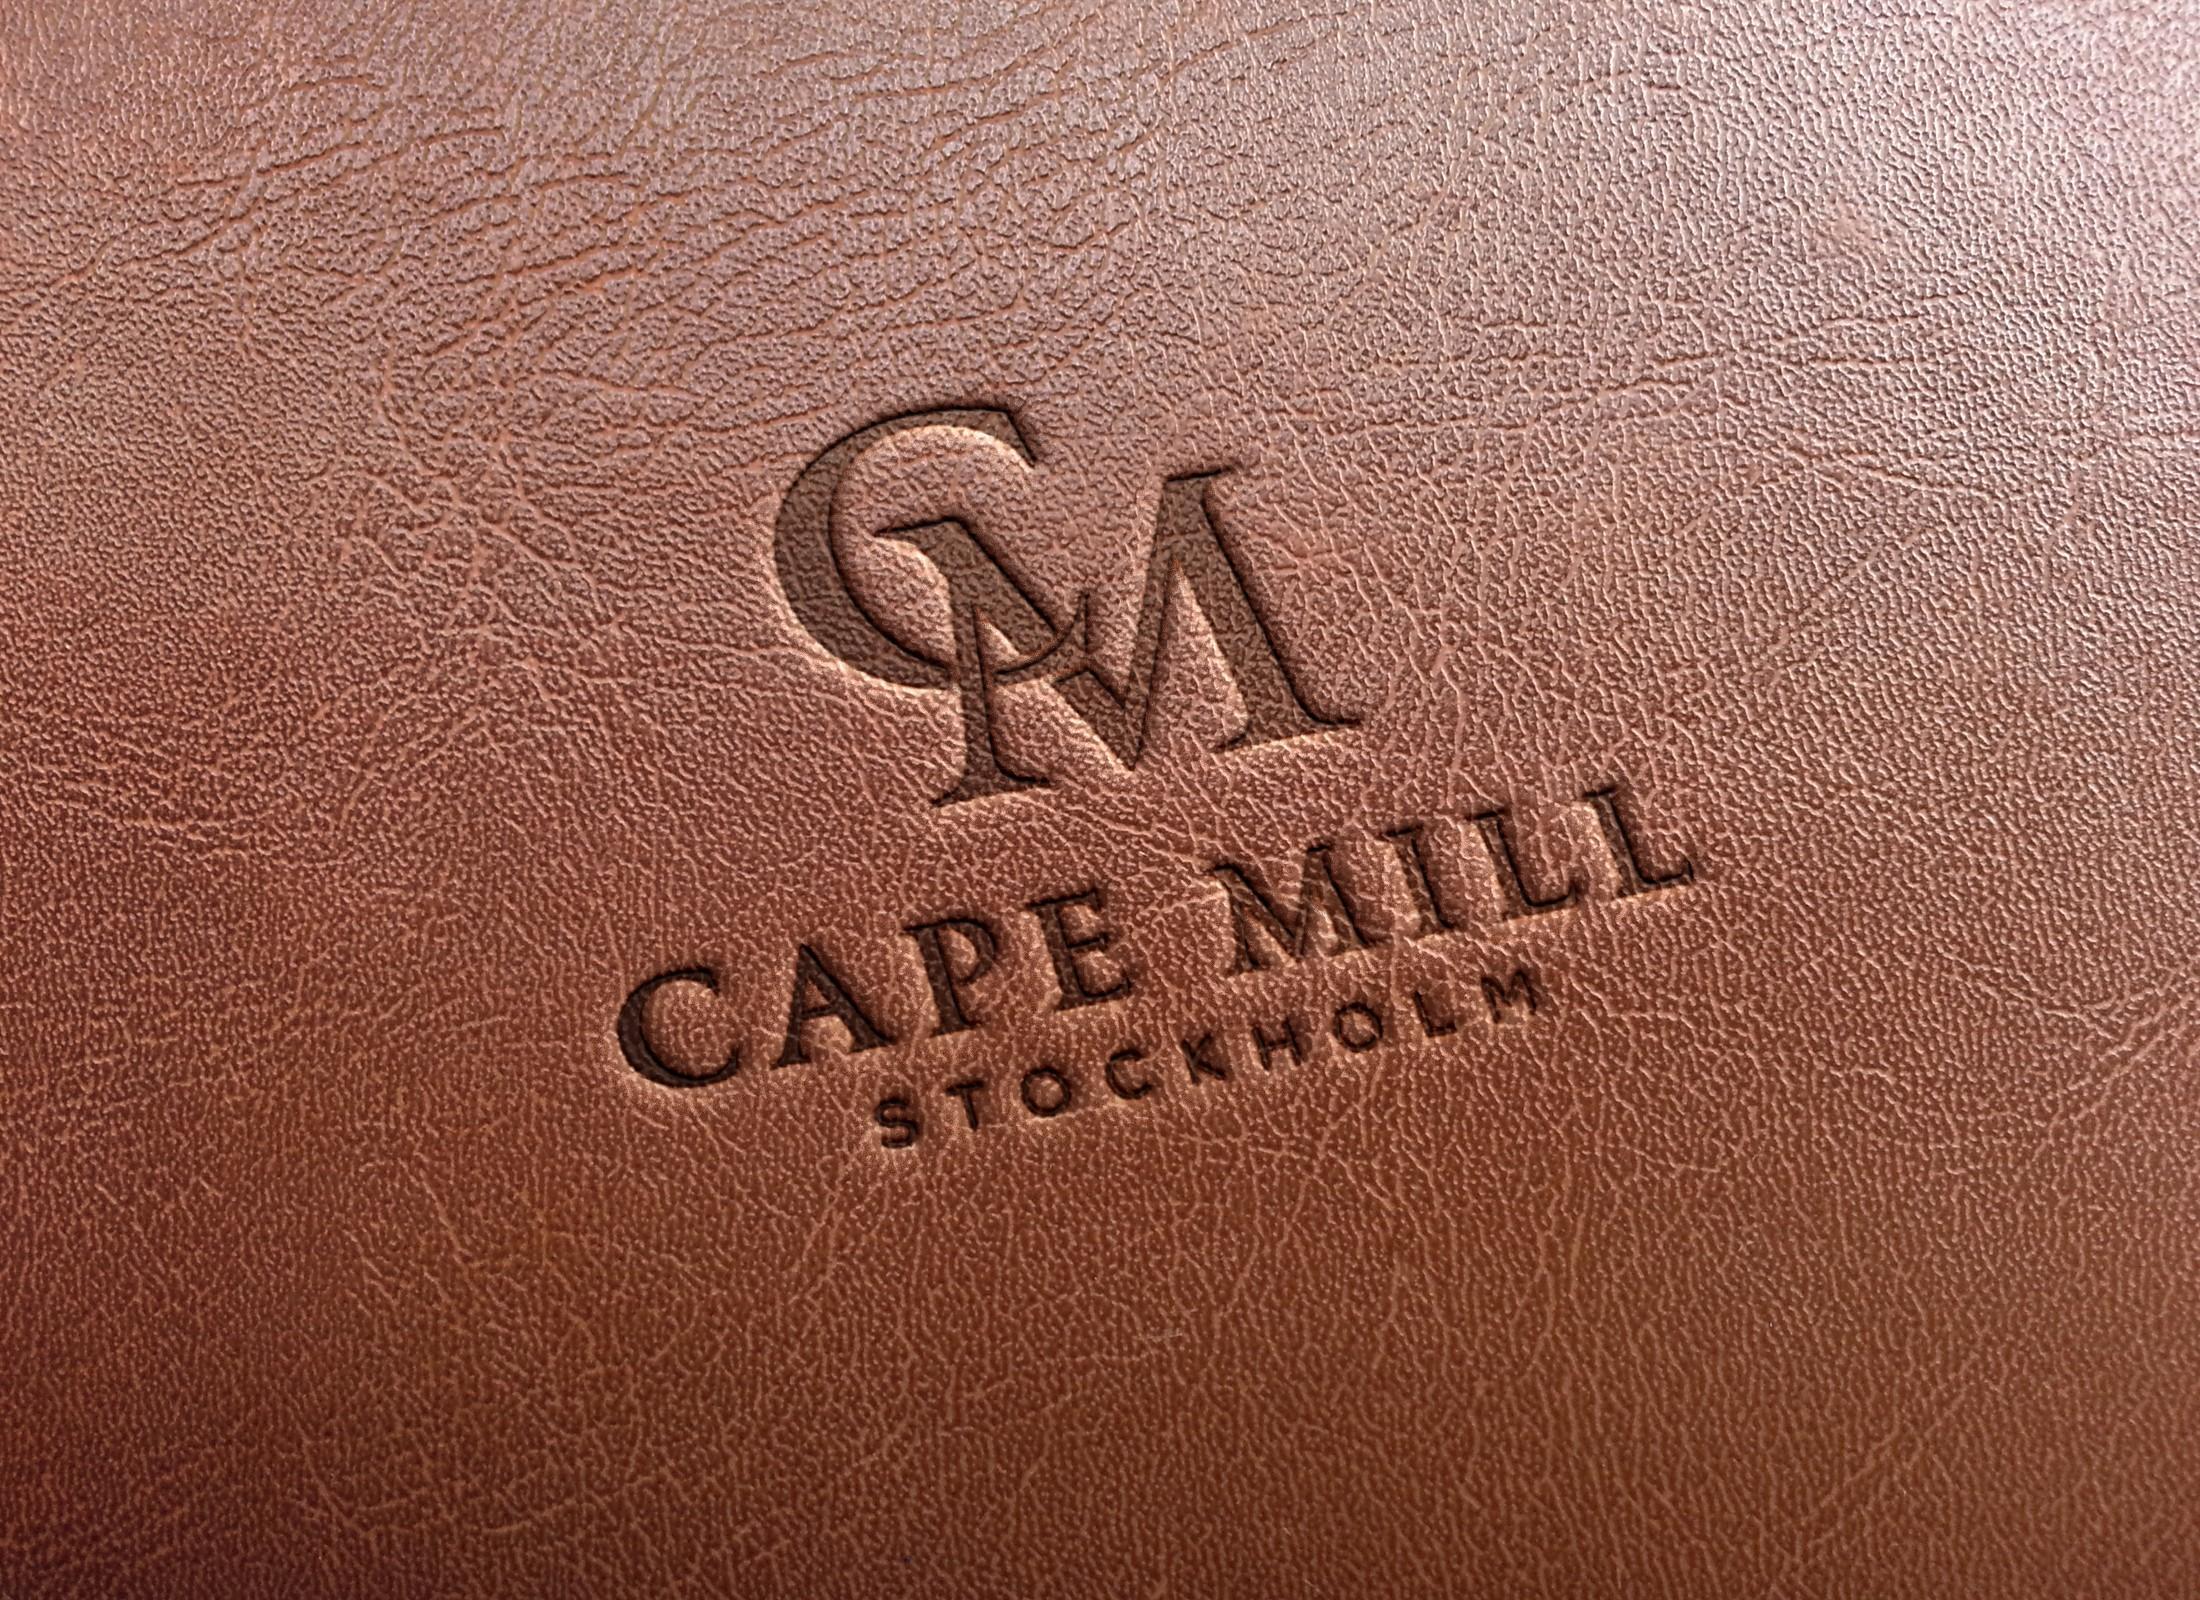 "Design a stylish logo for my new bracelet business ""Cape Mill"""